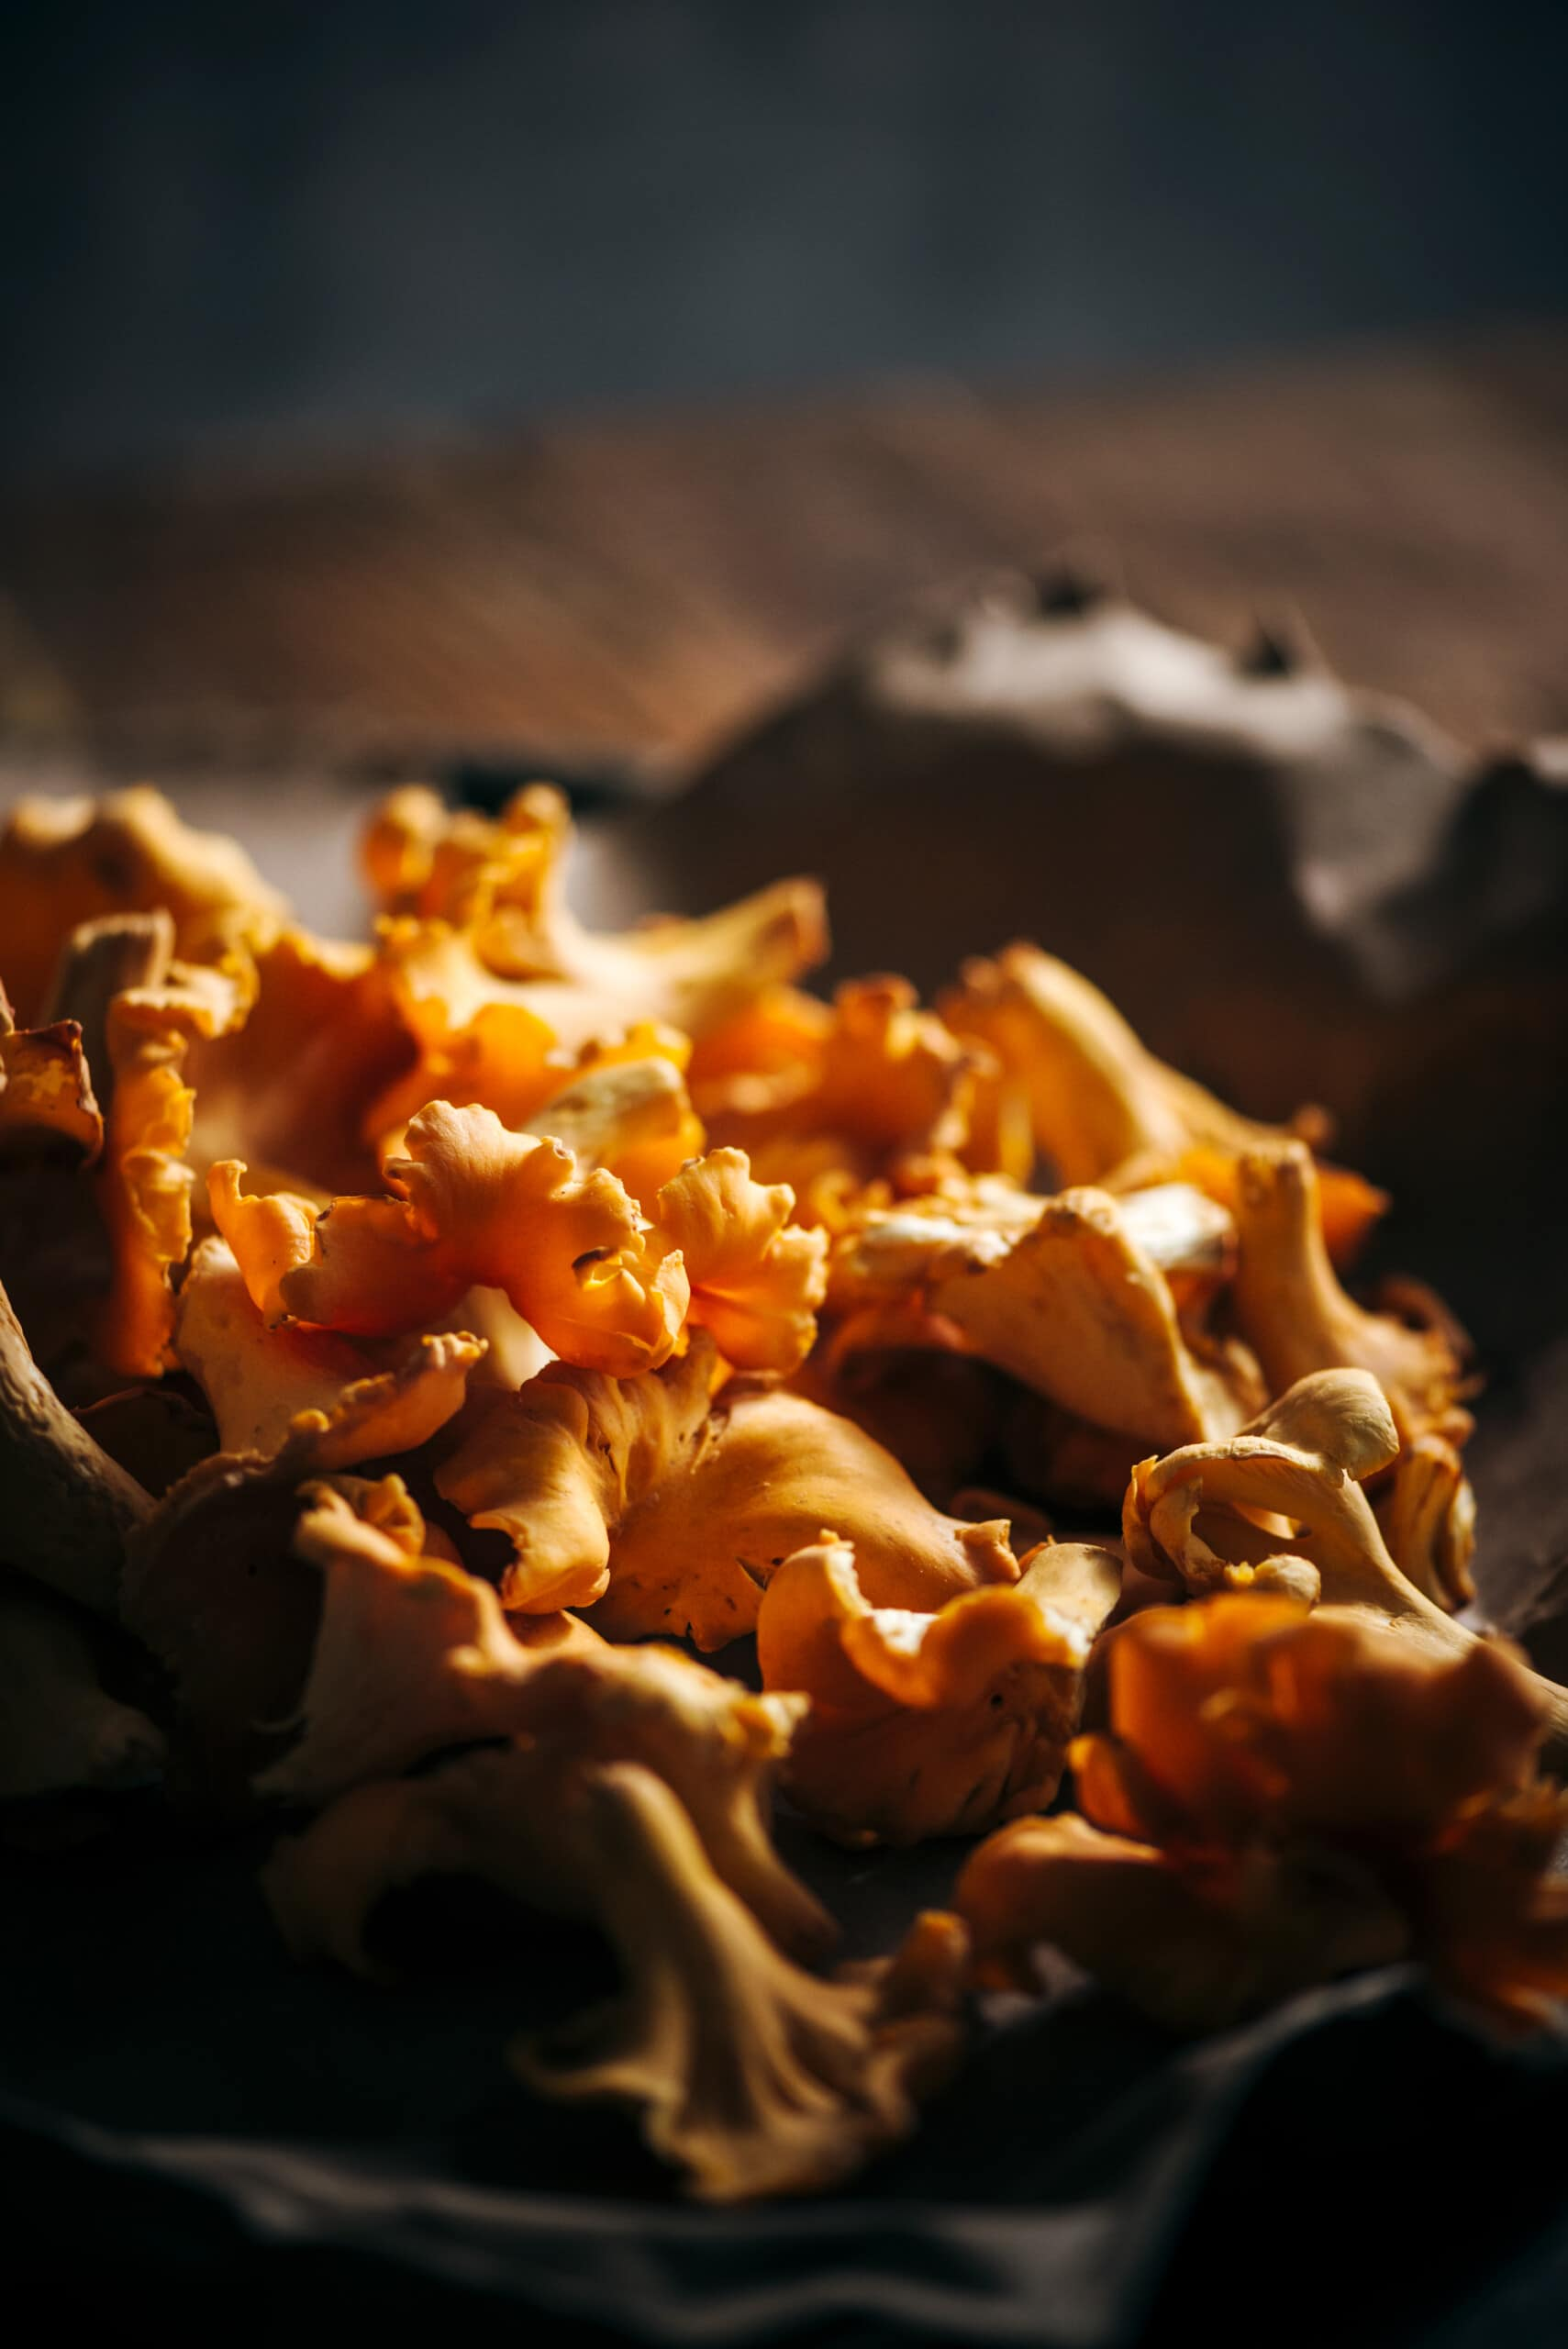 Wild food - Chanterelles Mushrooms